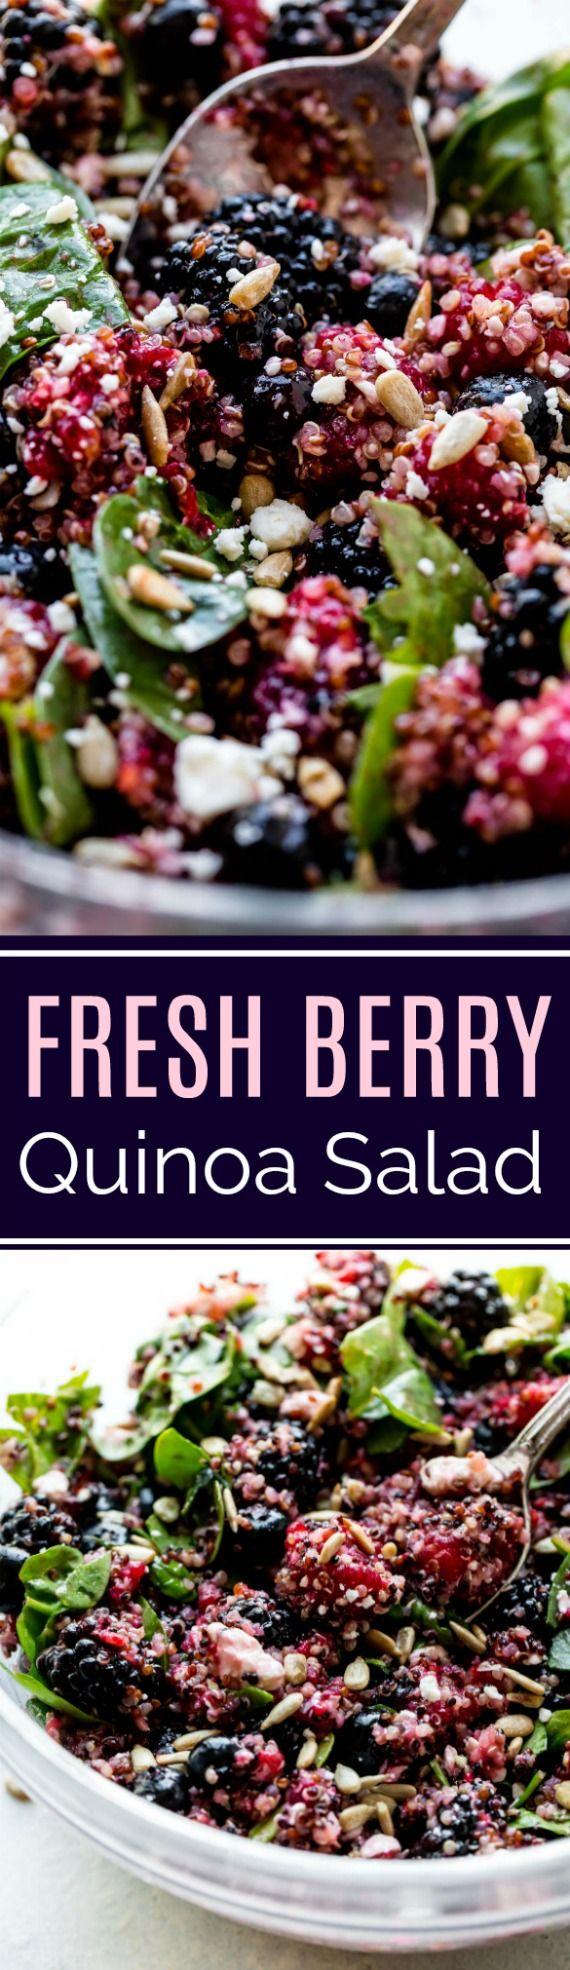 Fresh berries, gorgonzola cheese, spinach, basil, and a simple honey lemon dressing makes this healthy quinoa salad hit the spot! Recipe on sallysbakingaddiction.com